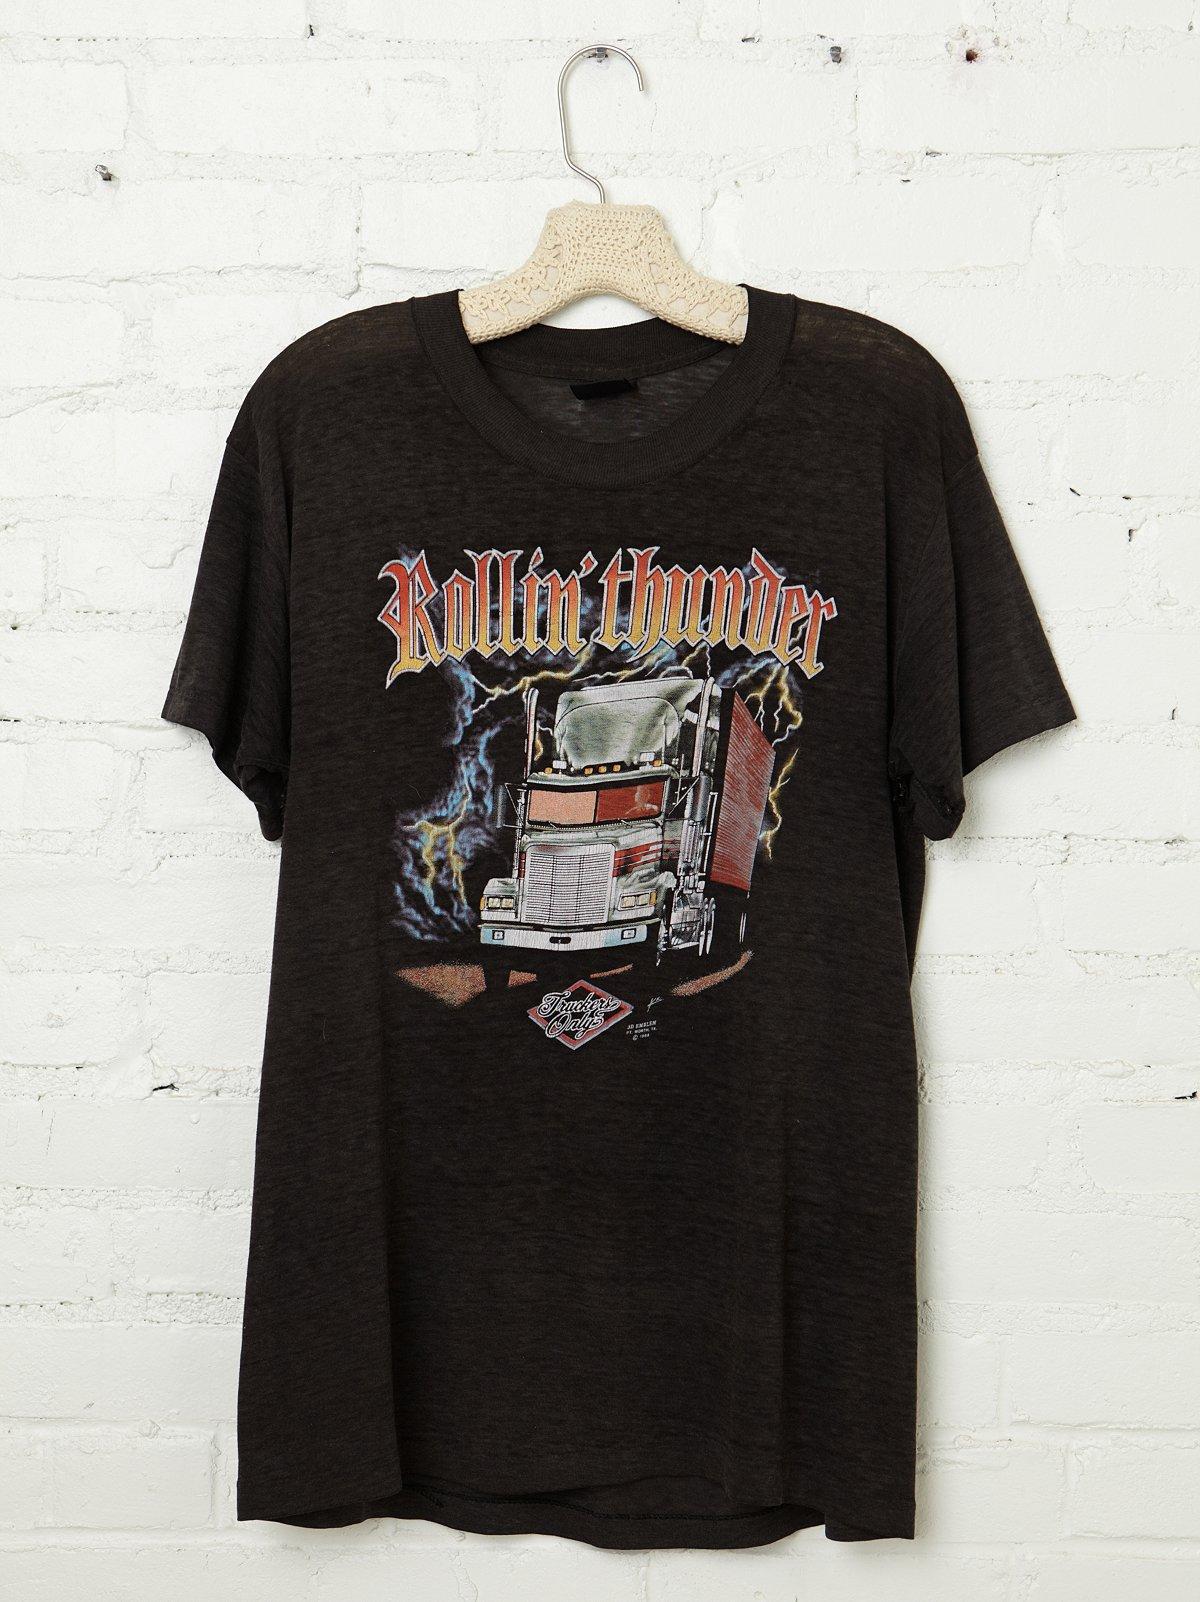 Vintage Rollin' Thunder Tee